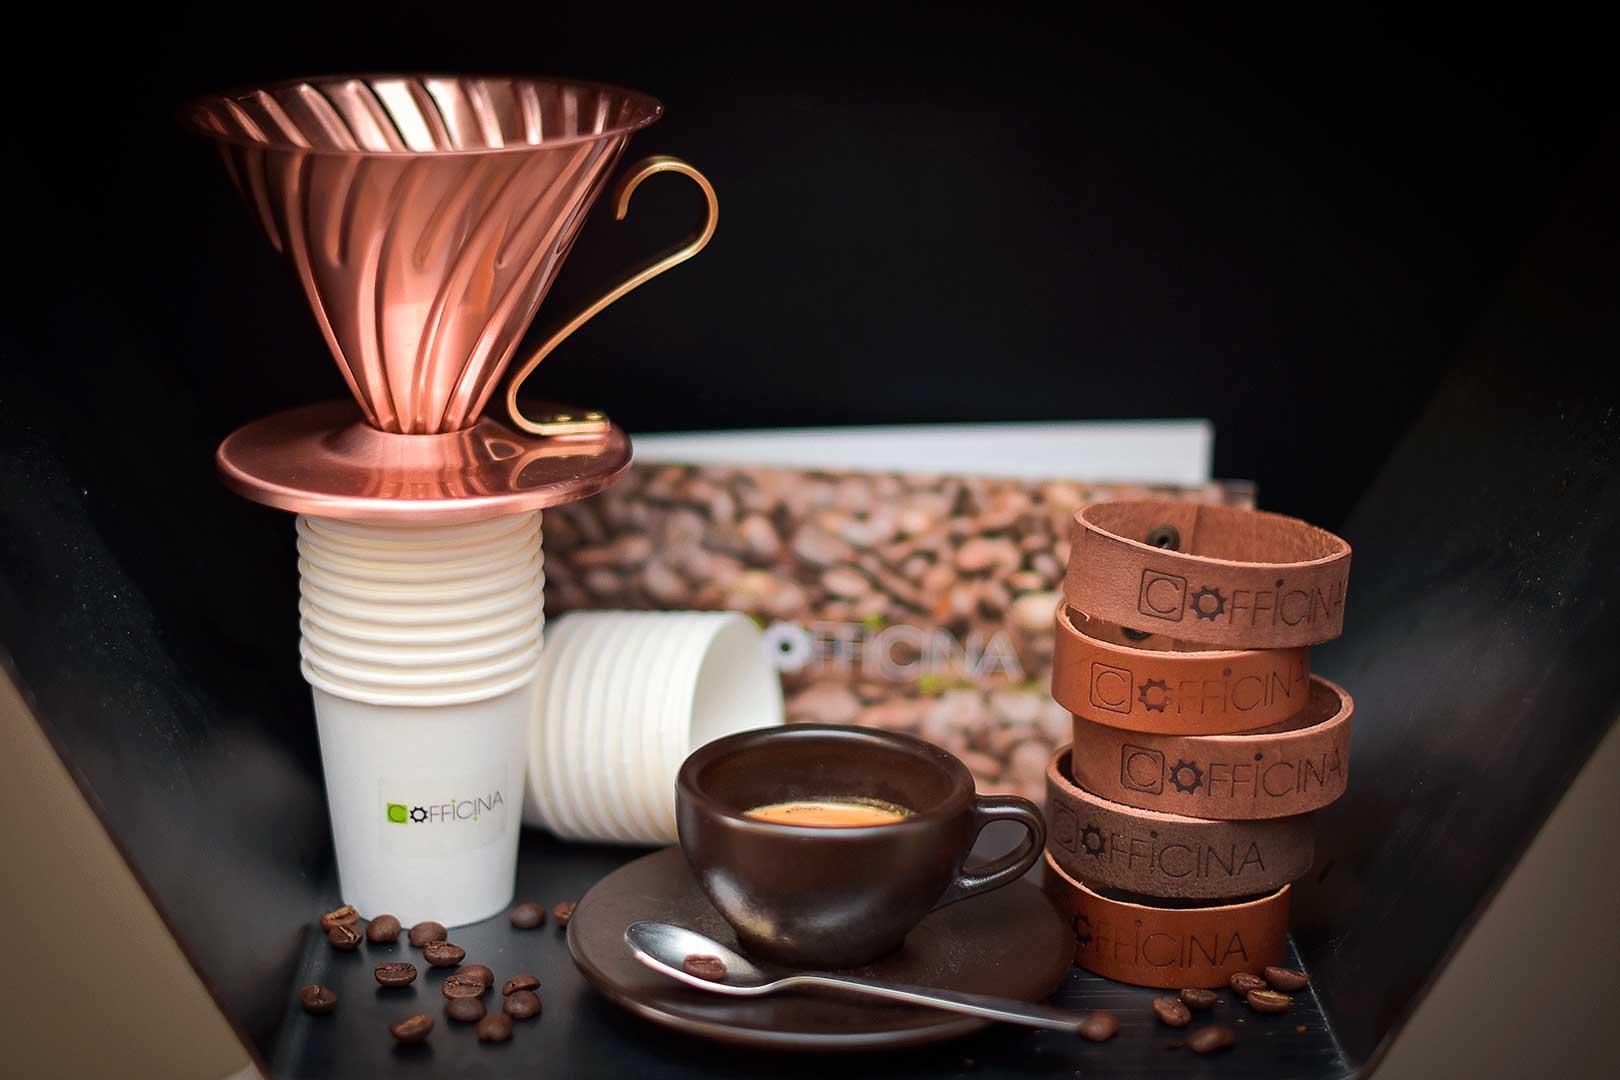 5 Indirizzi per caffè e pasticcini - Cofficina